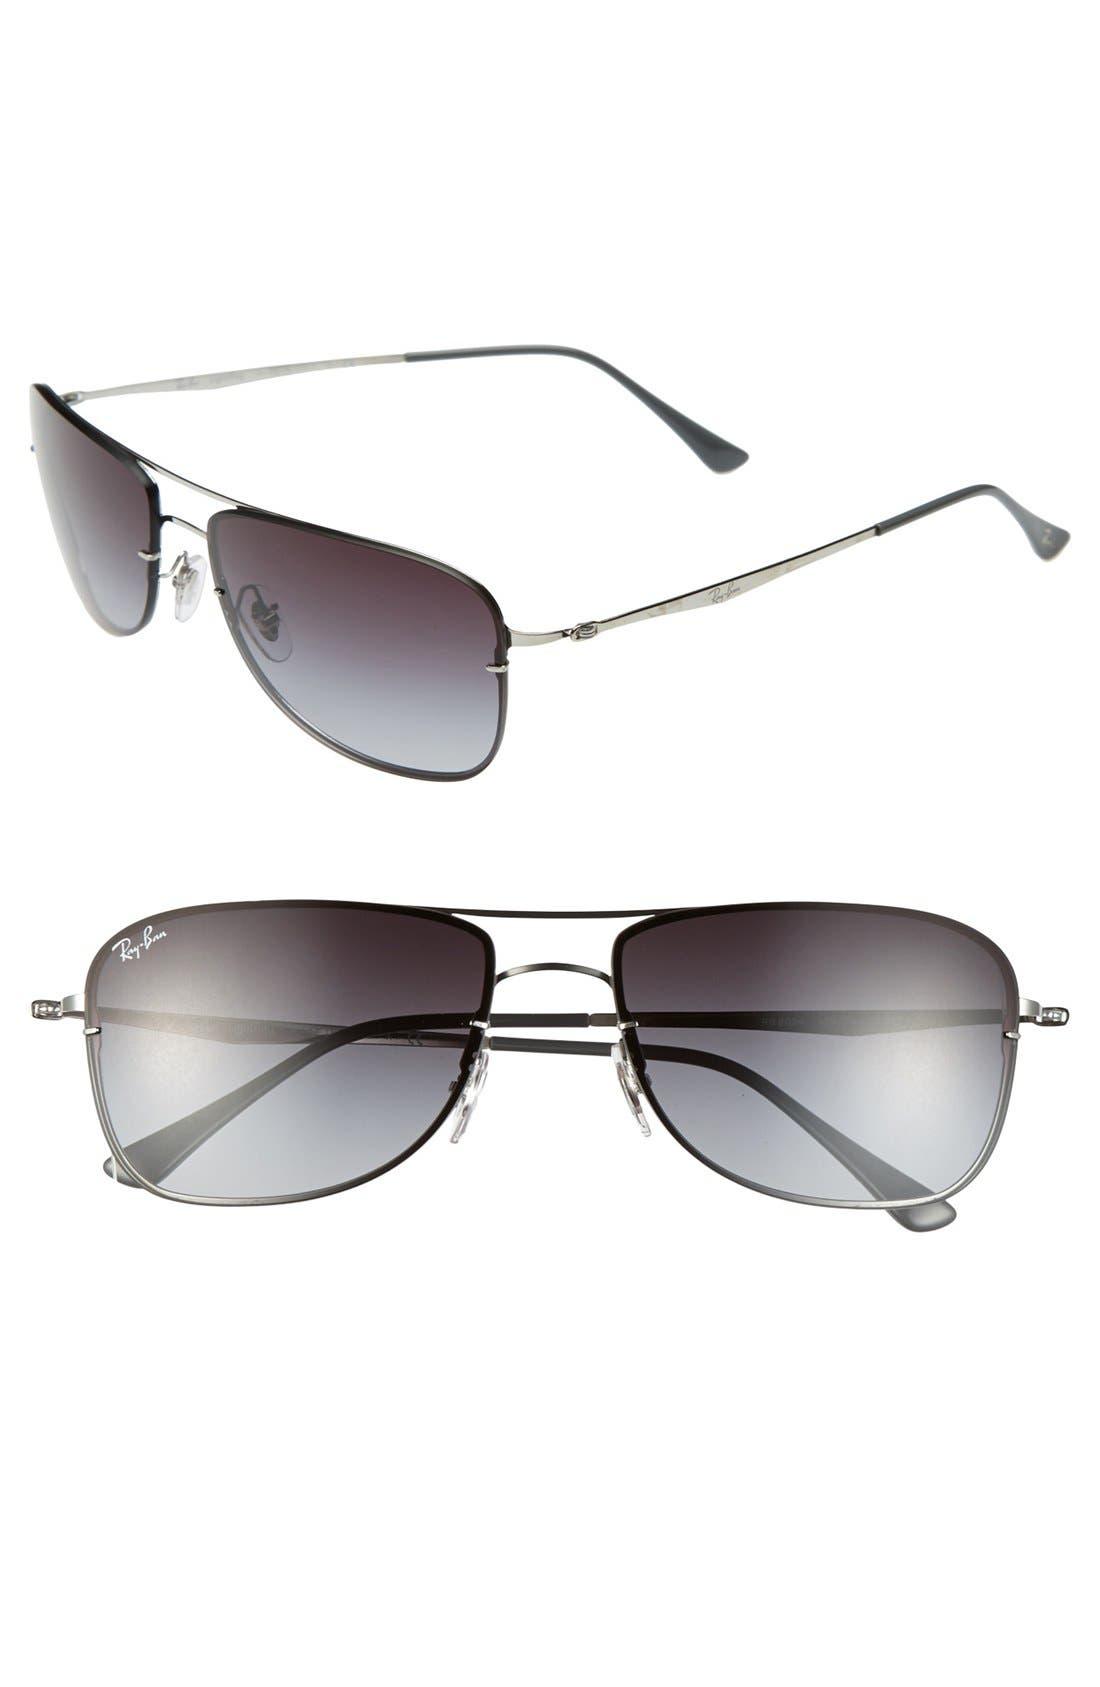 Main Image - Ray-Ban 59mm Pilot Sunglasses